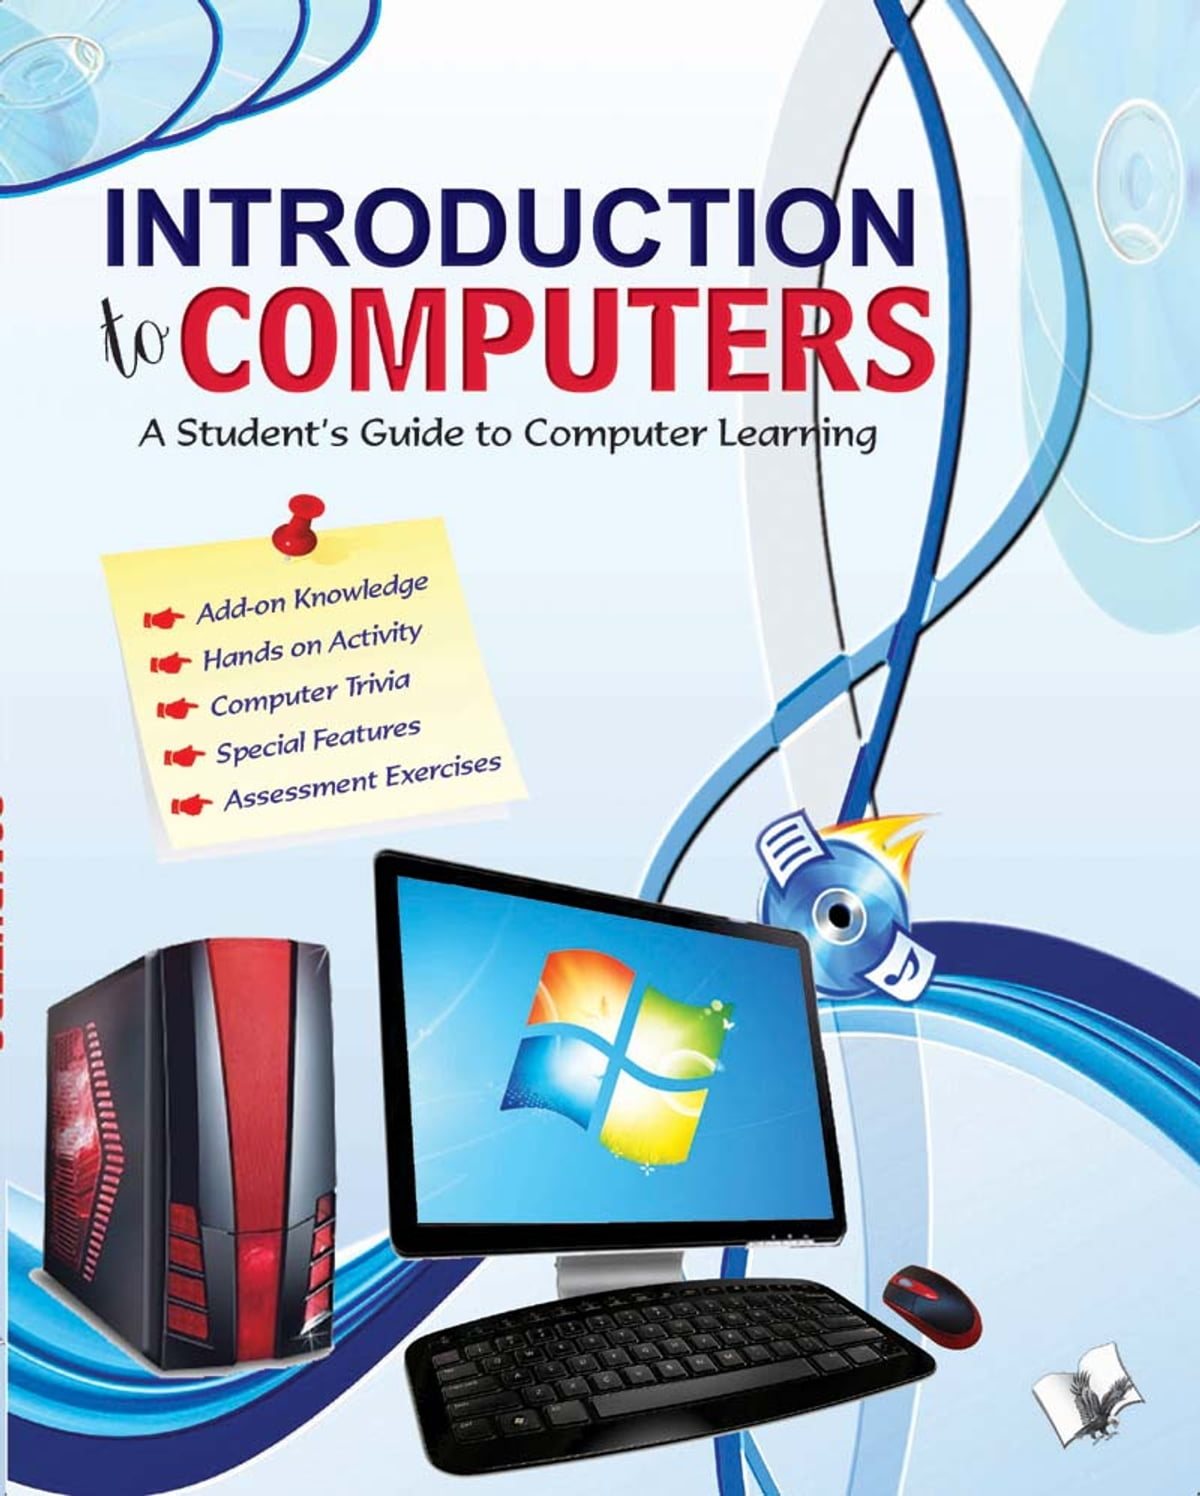 Introduction To Computers Ebook By Ms Shikha Nautiyal